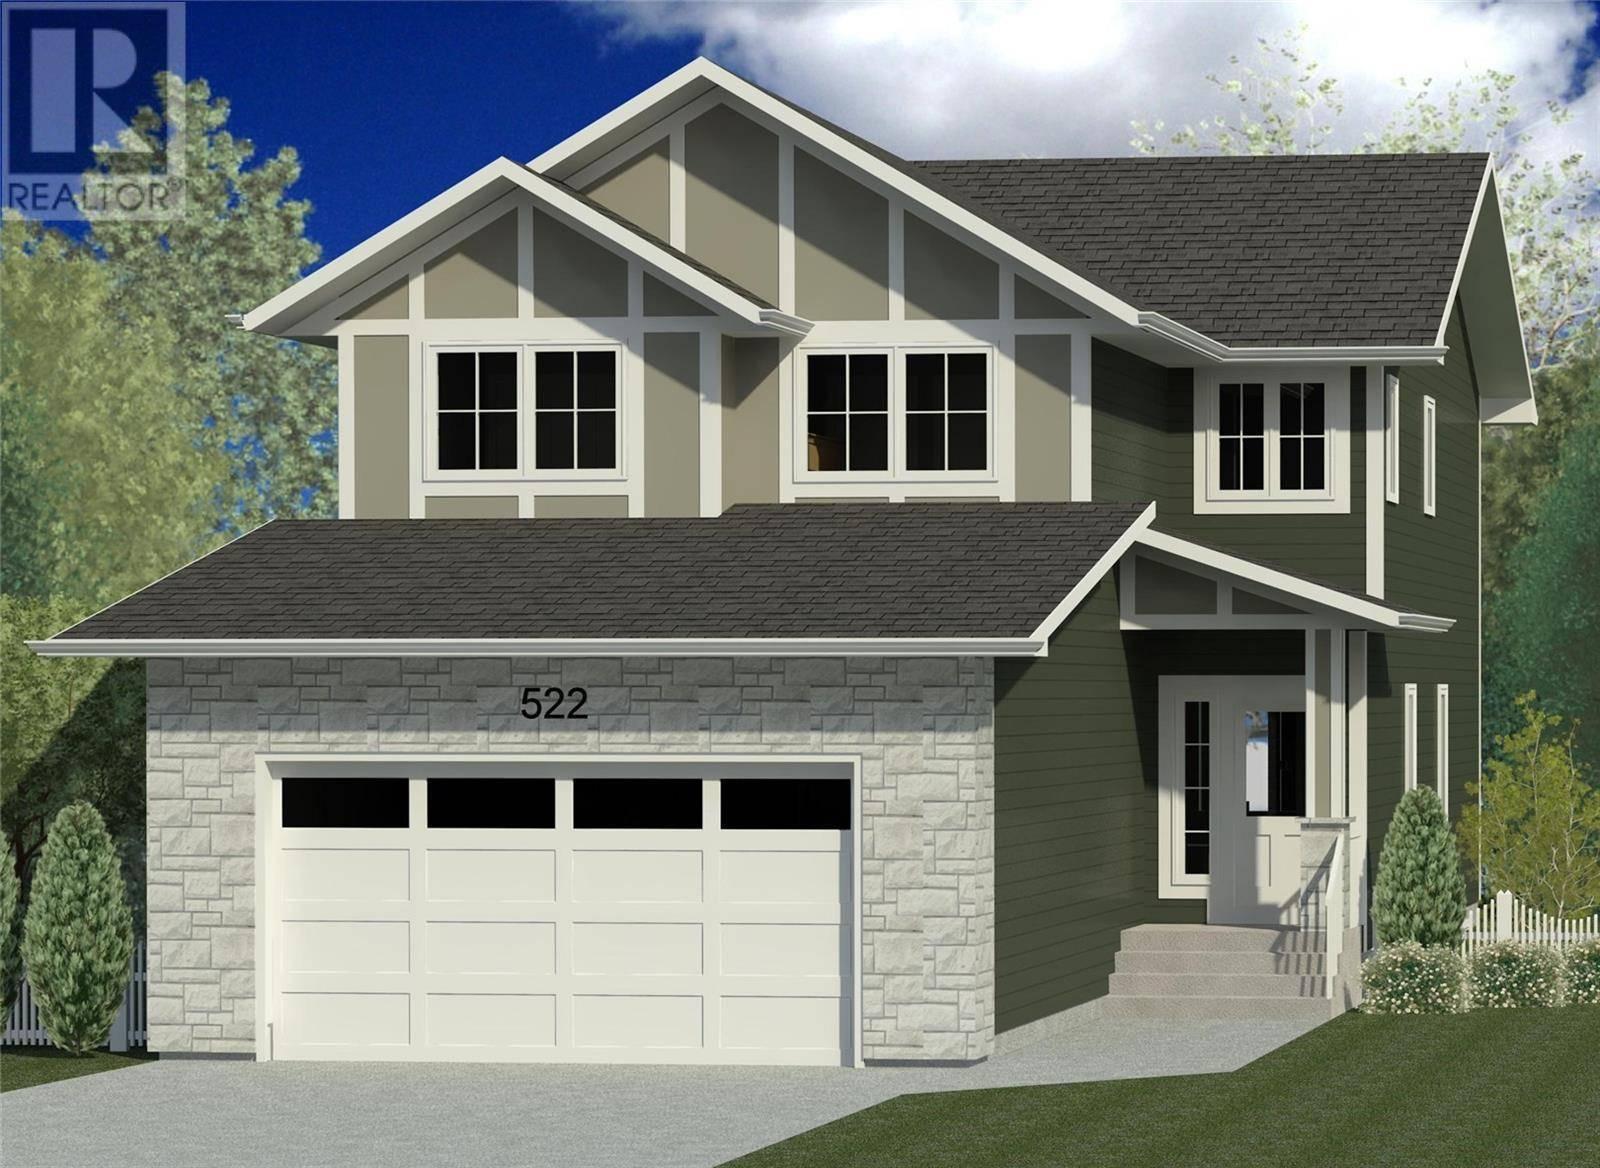 House for sale at 522 Germain Wy Saskatoon Saskatchewan - MLS: SK791139